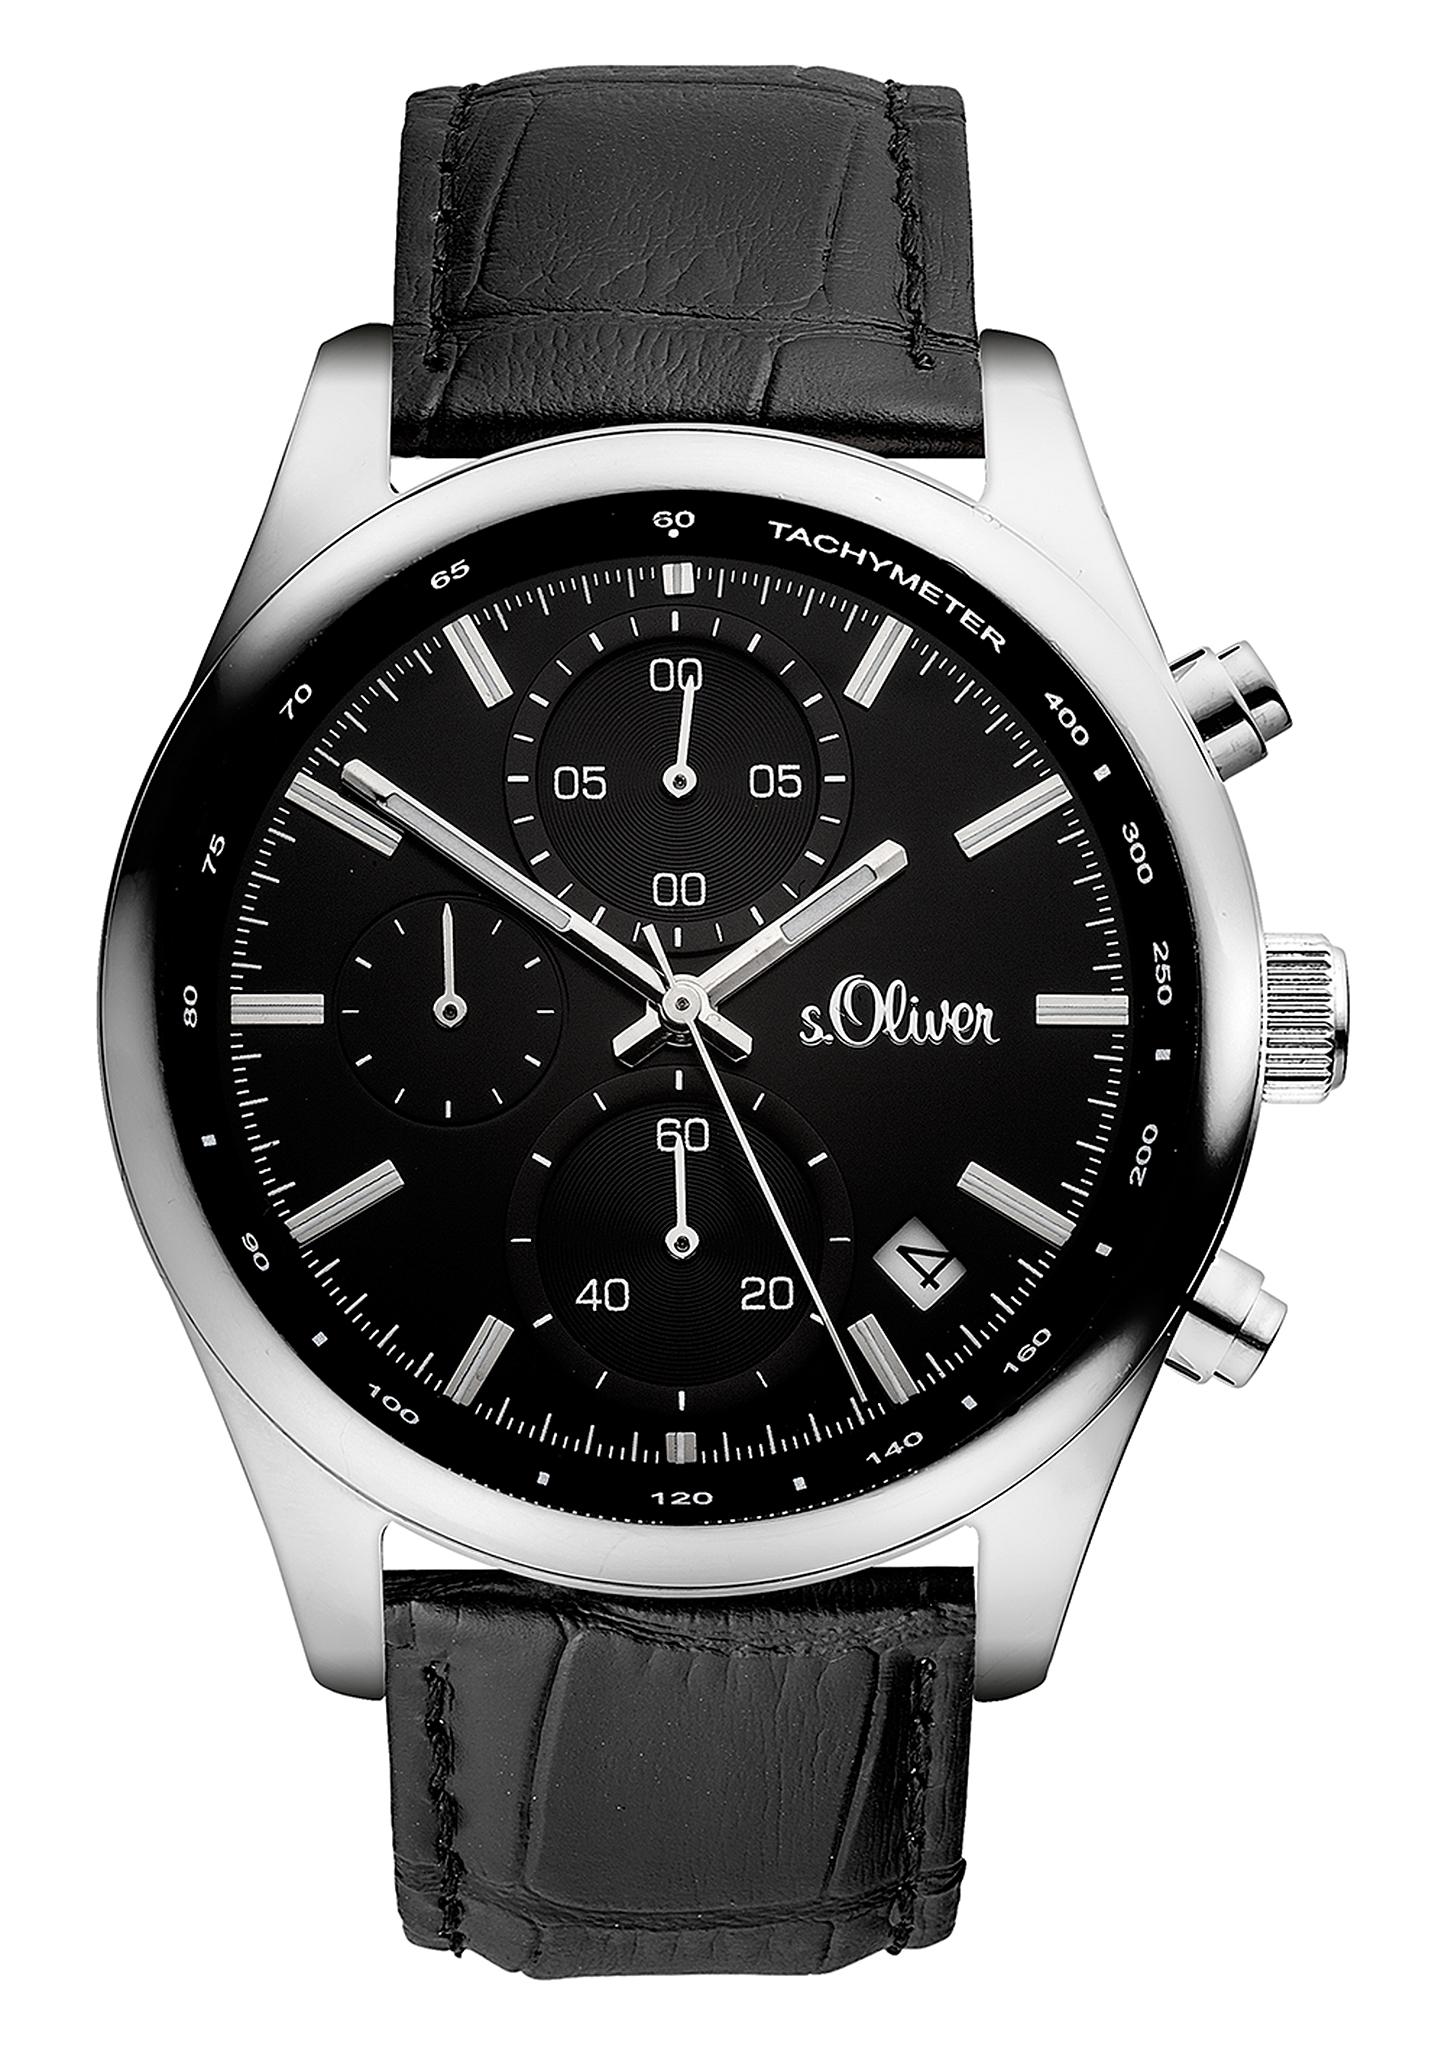 Chronograph | Uhren | Grau/schwarz | s.Oliver